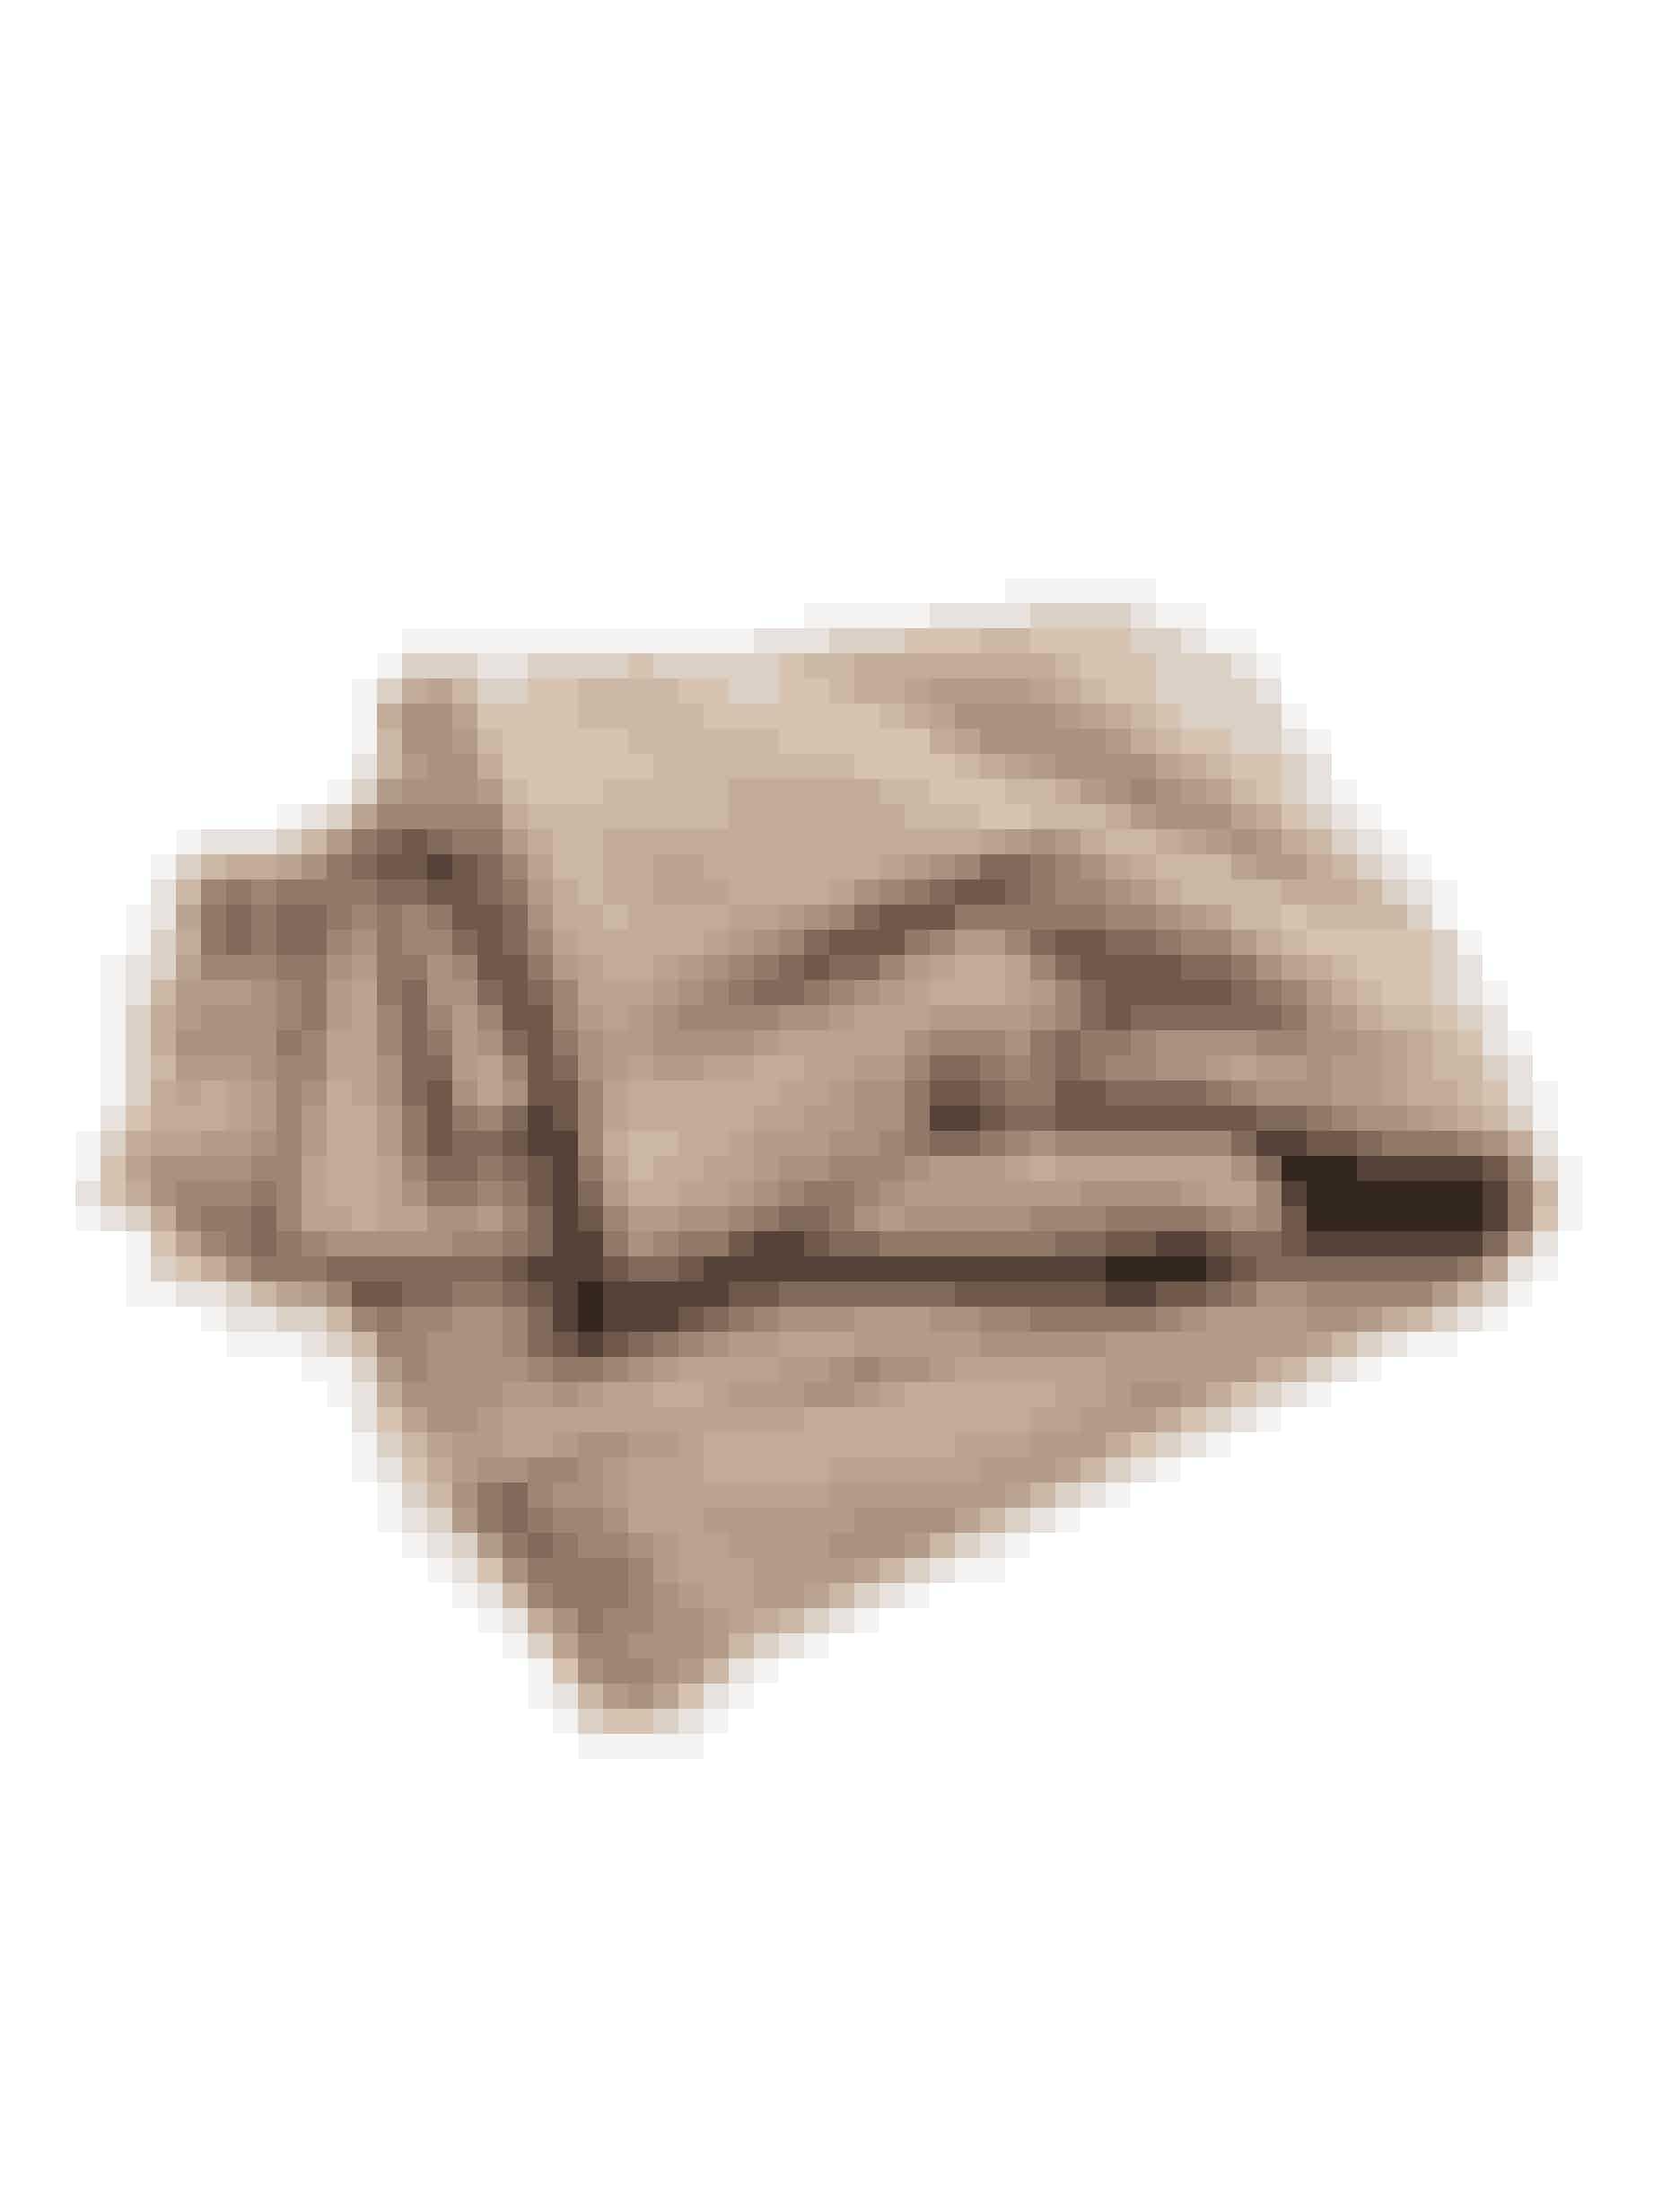 Mono blanket plaid, Hay, 499 kr.Køb onlineher.